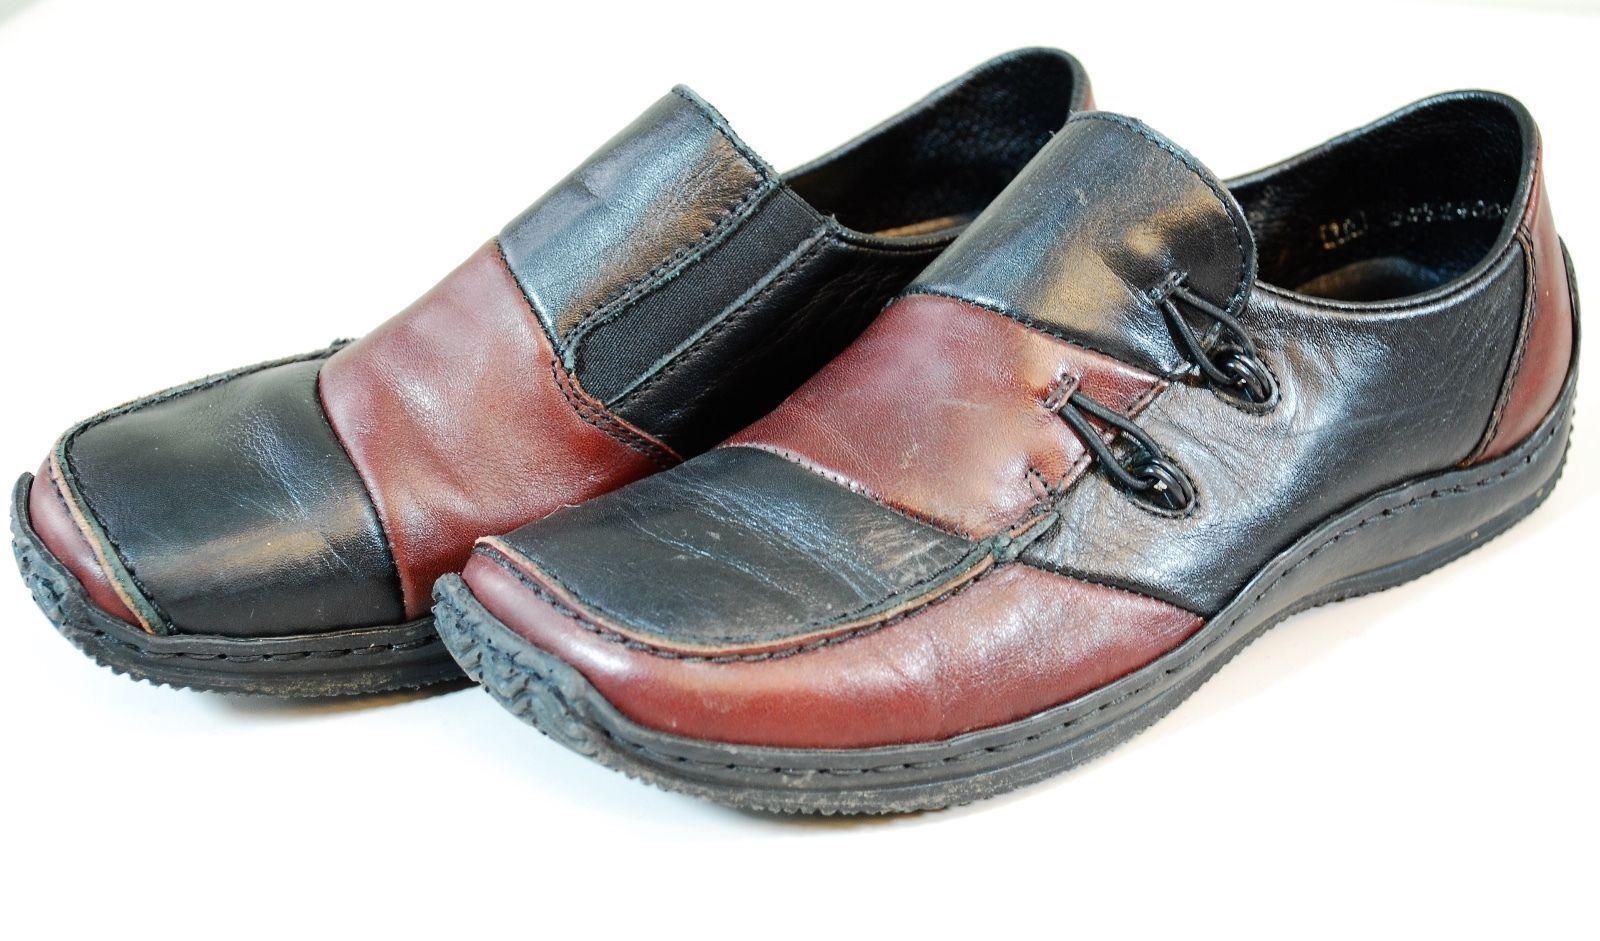 Rieker Celia 51 Women's Slip On Loafer shoes EU 36 Black Red Leather Antistress